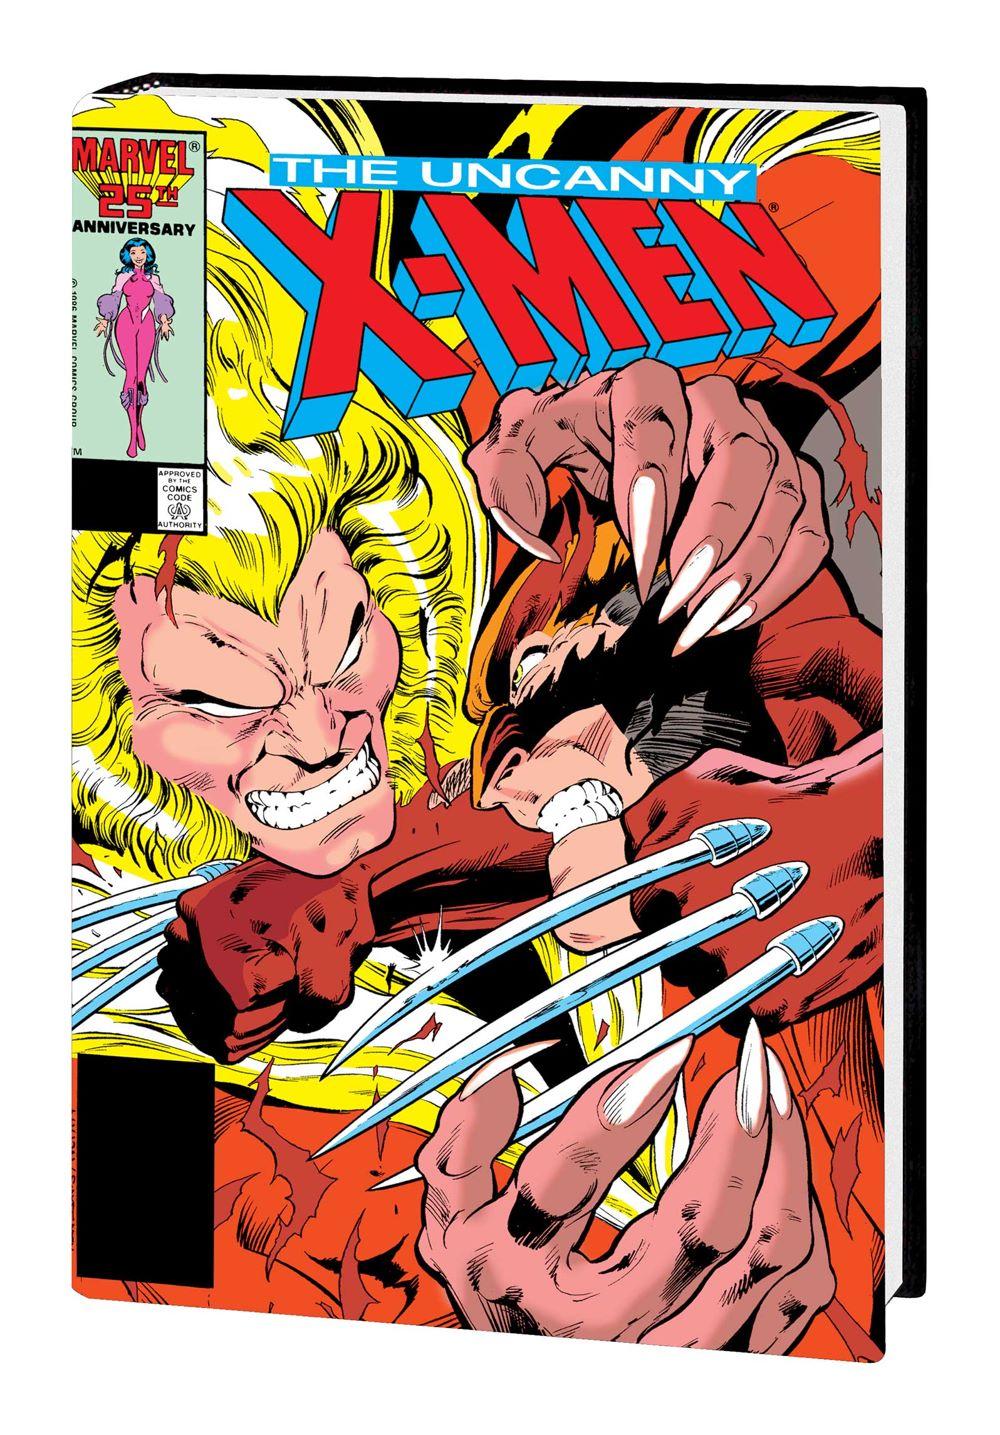 XMEN_MM_OMNI_HC_DAVIS Marvel Comics August 2021 Solicitations